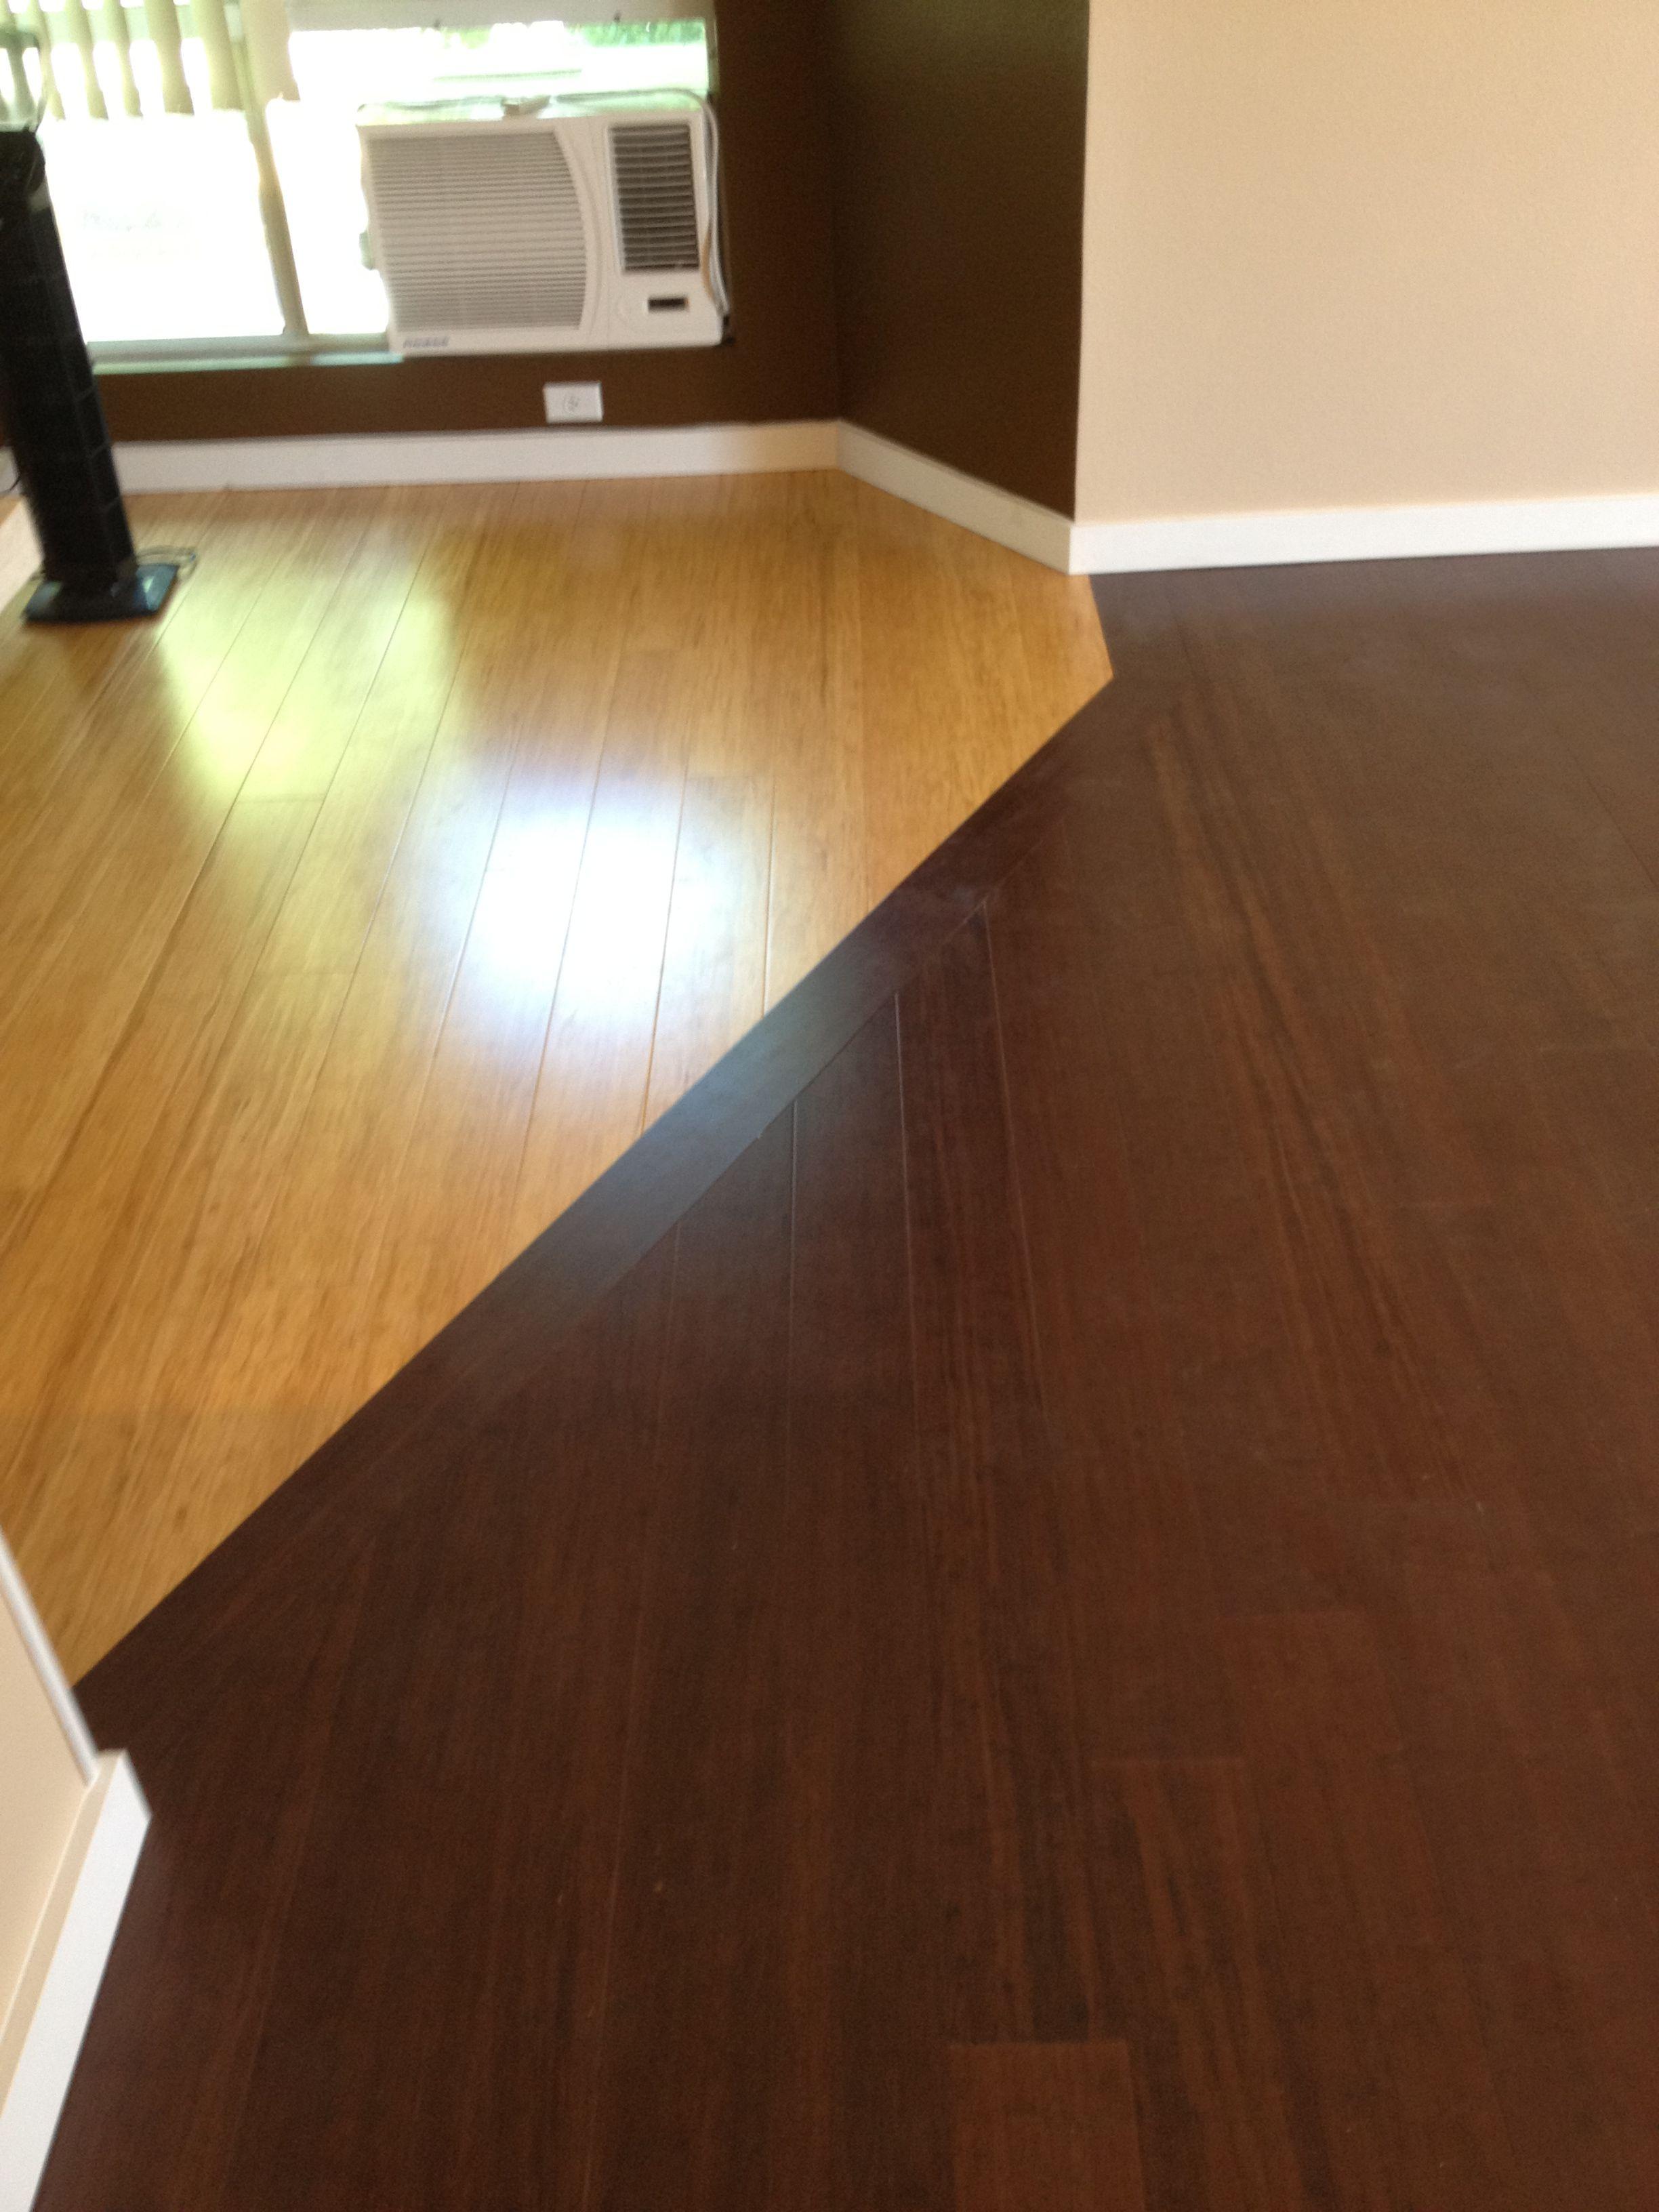 Two Toned Wood Floors Honolulu Hawaii Allbuildconstruction